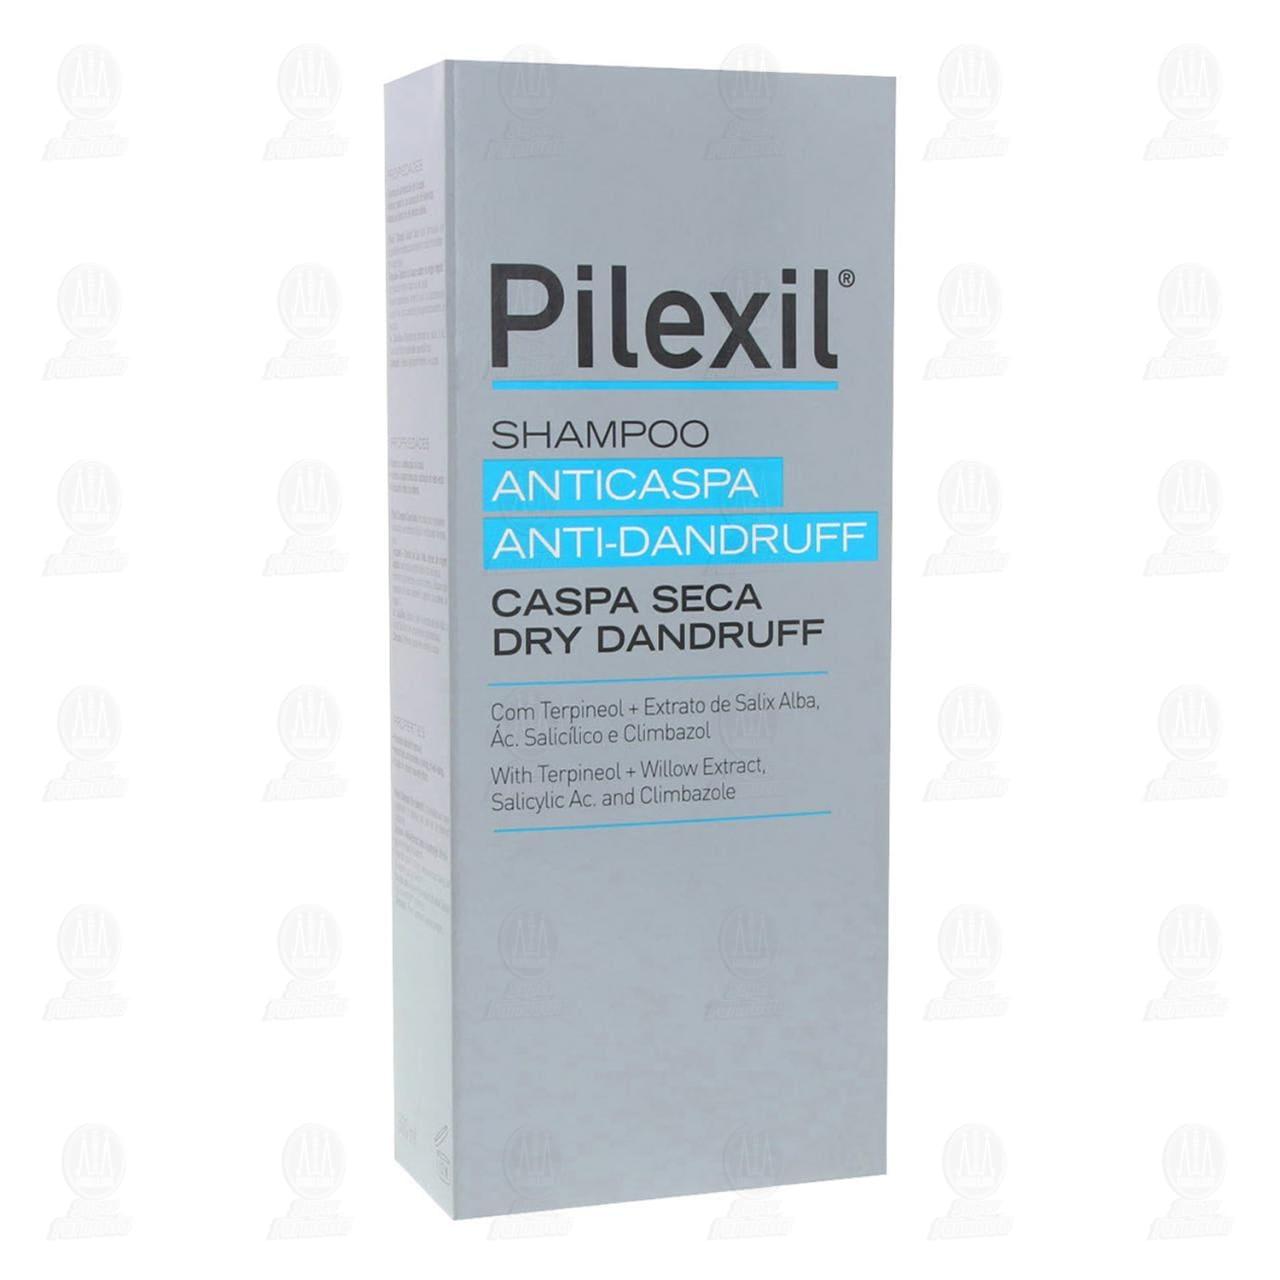 Comprar Pilexil Shampoo Anticaspa Seca, 300 ml. en Farmacias Guadalajara